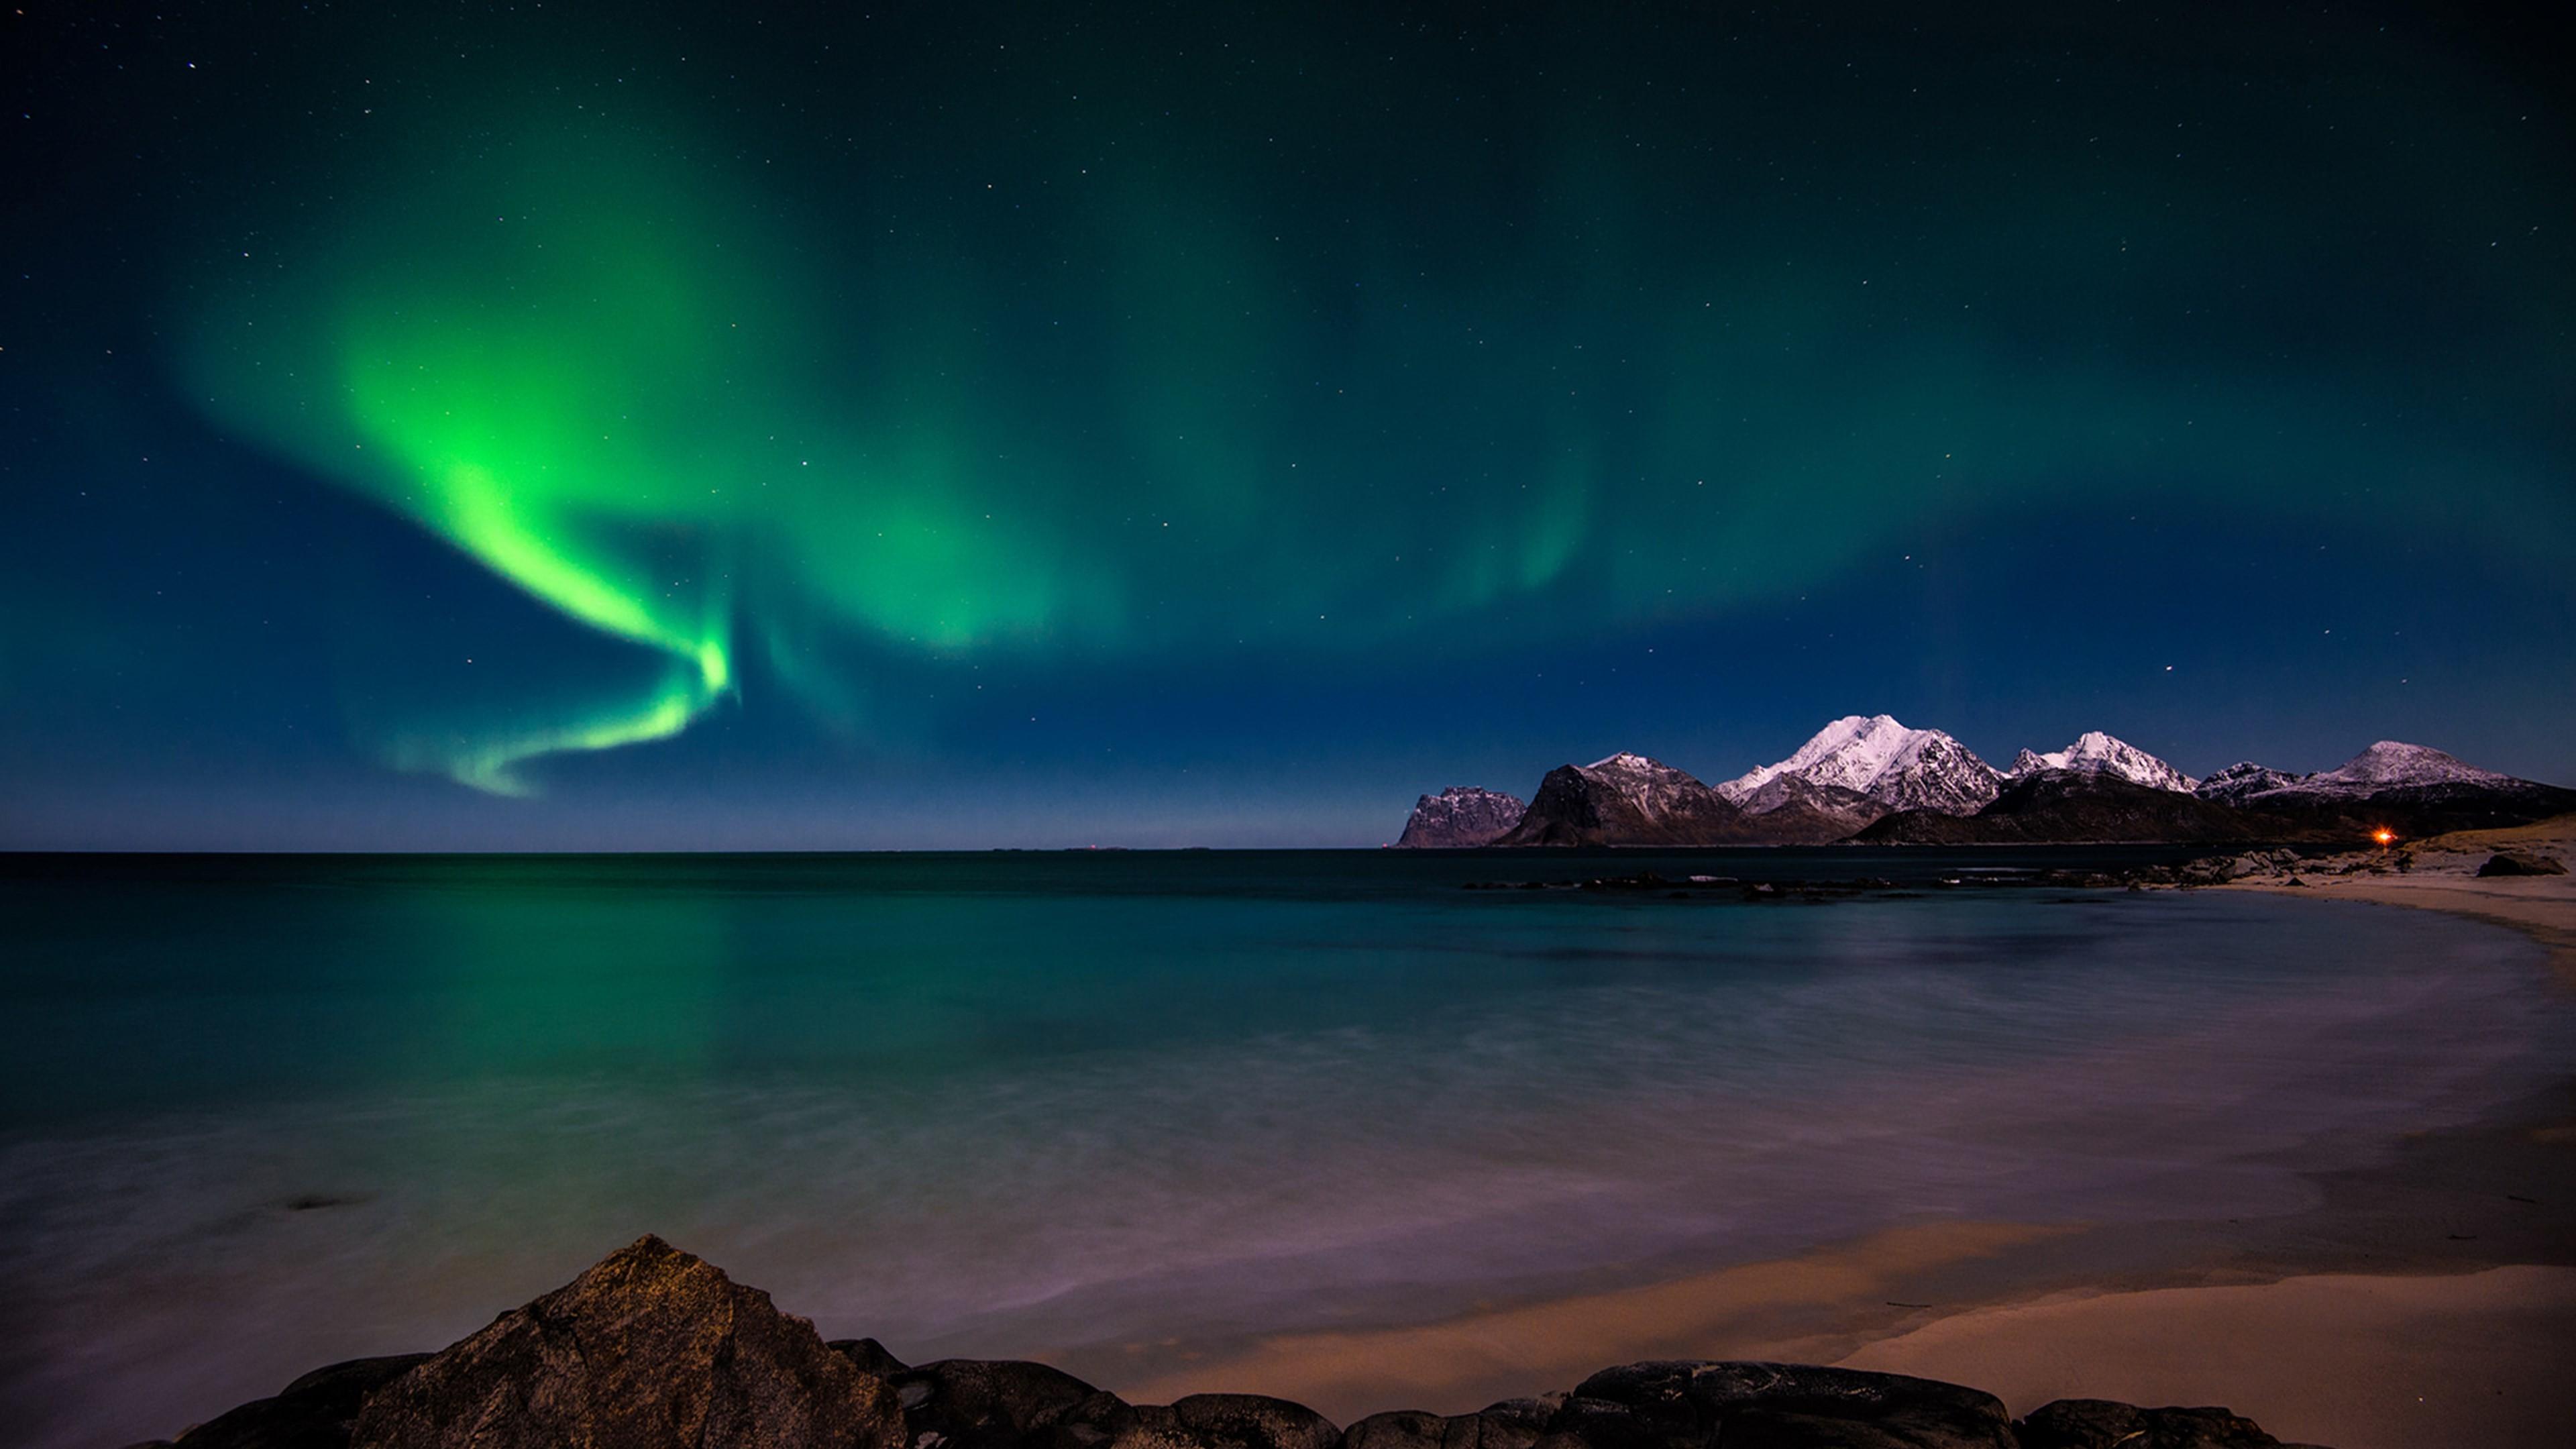 4k wallpaper aurora borealis (3840×2160)